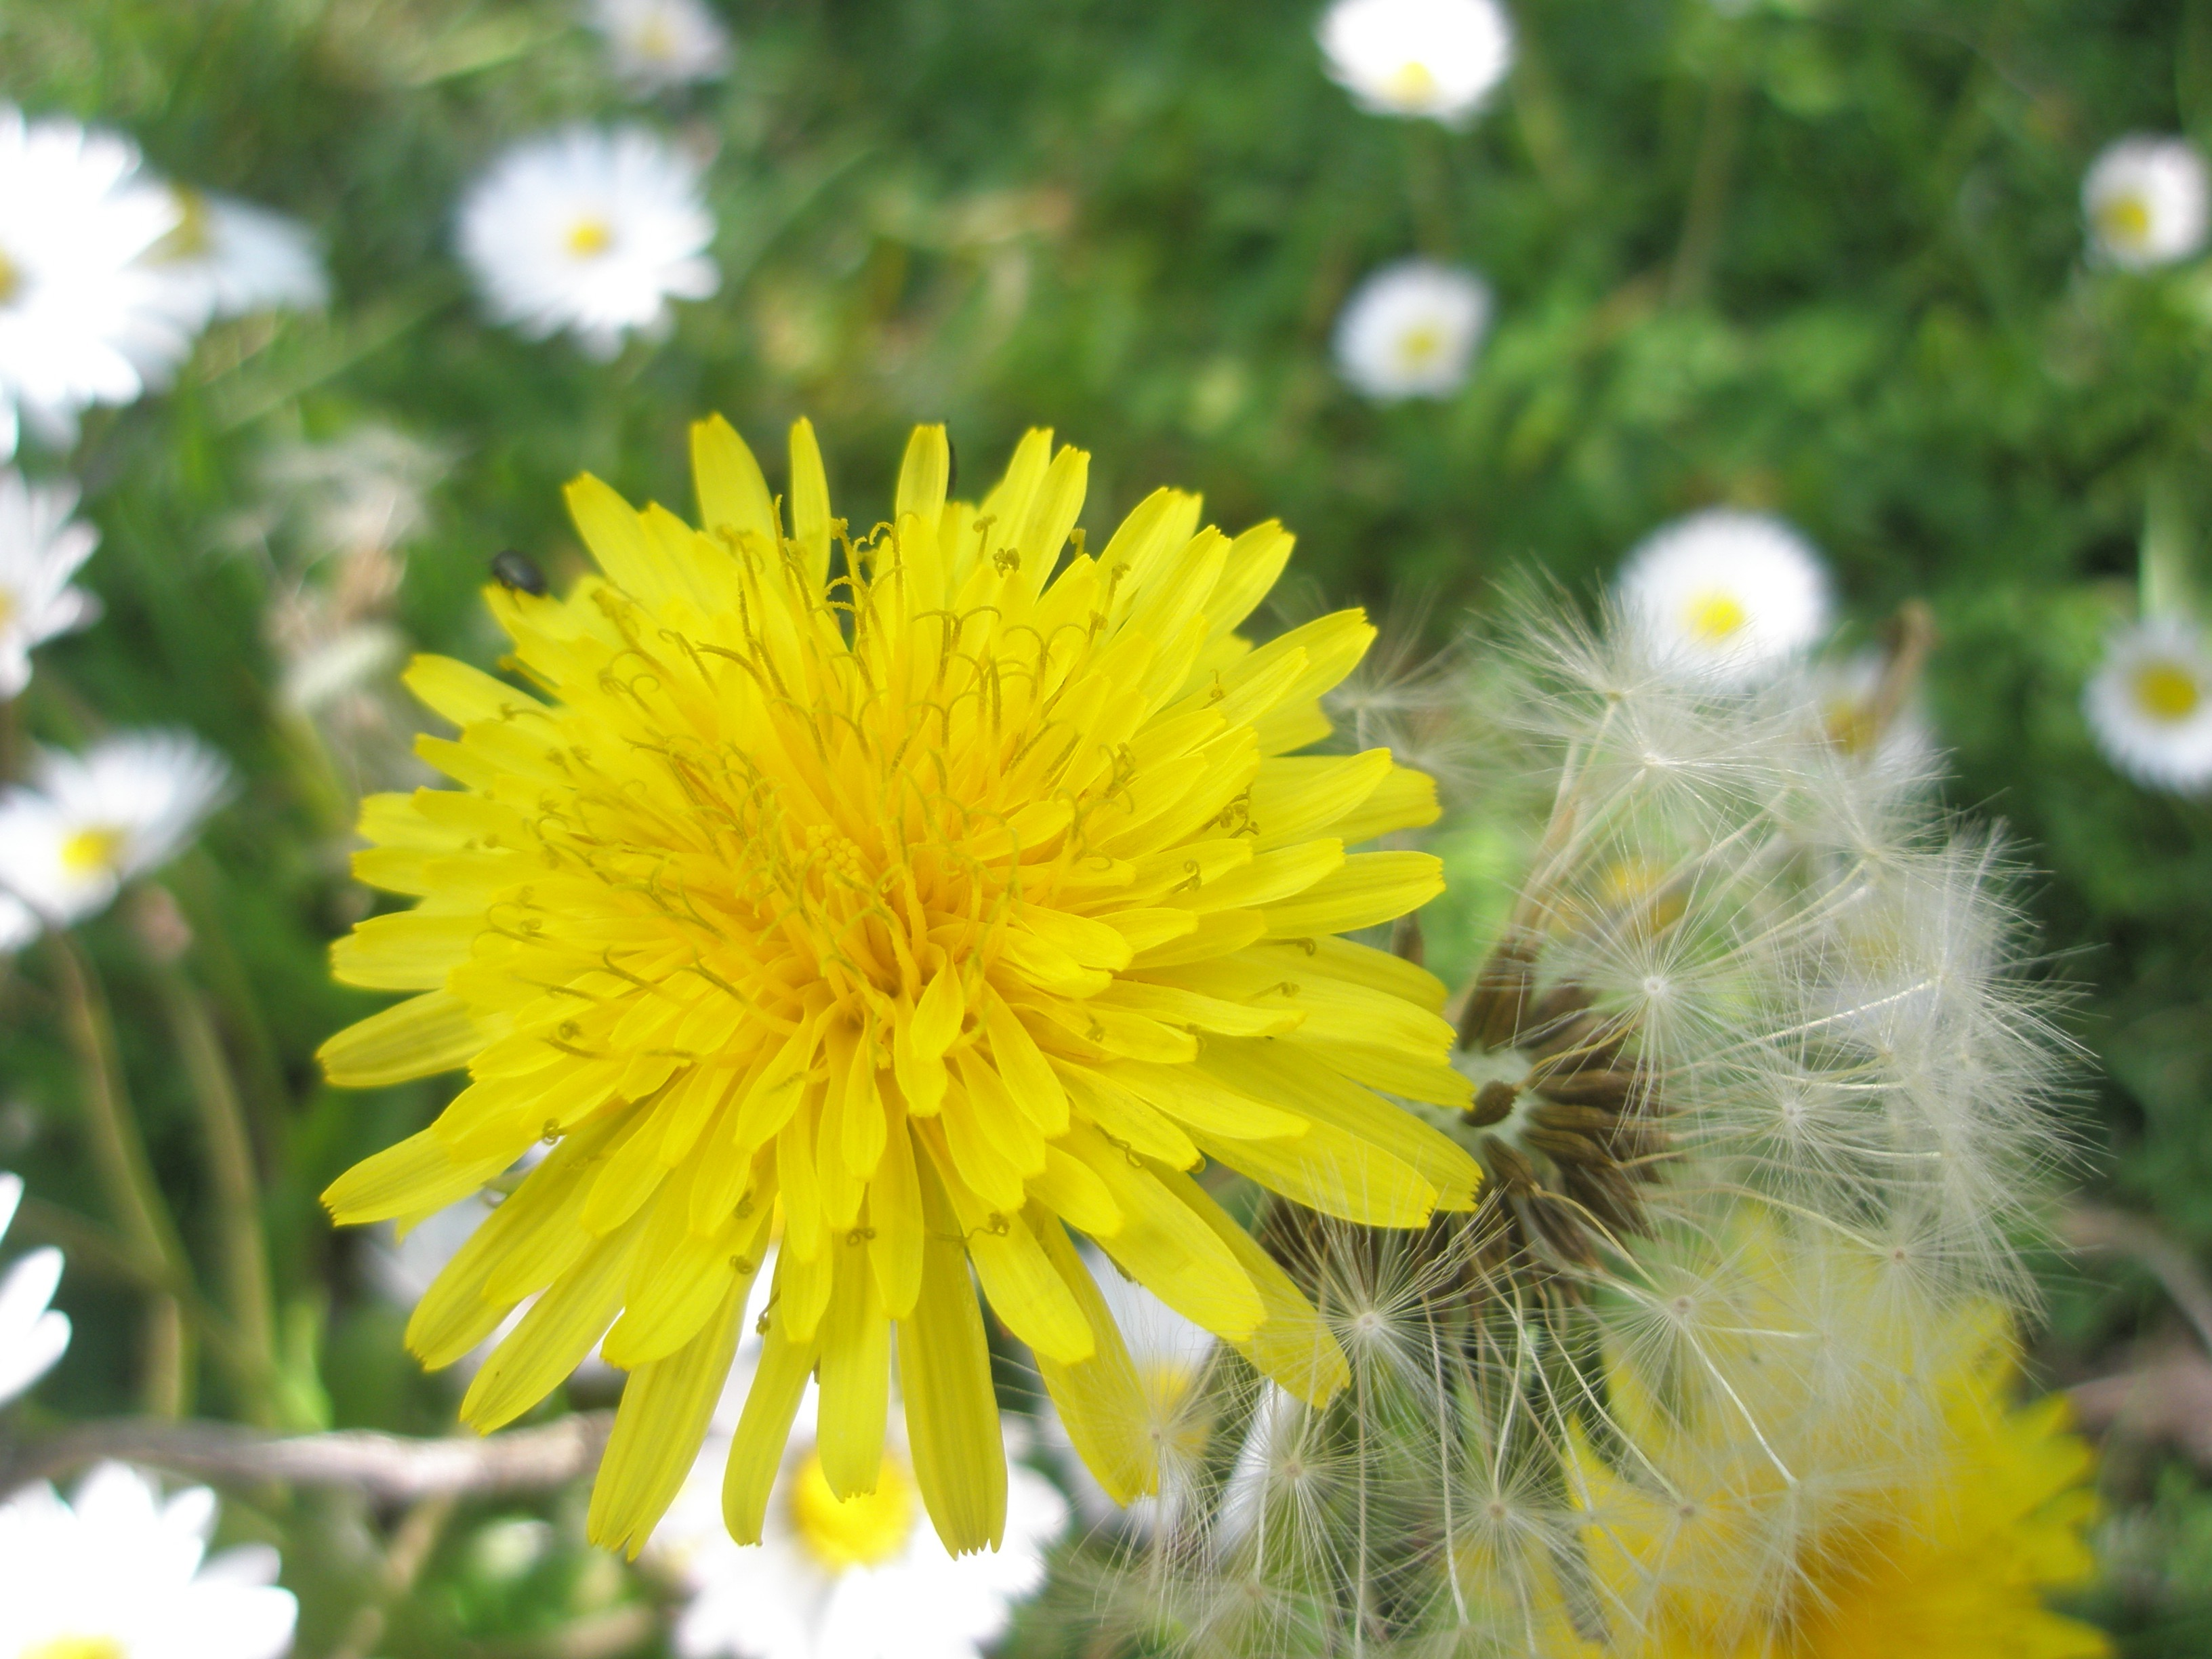 Dandelion Flower Code